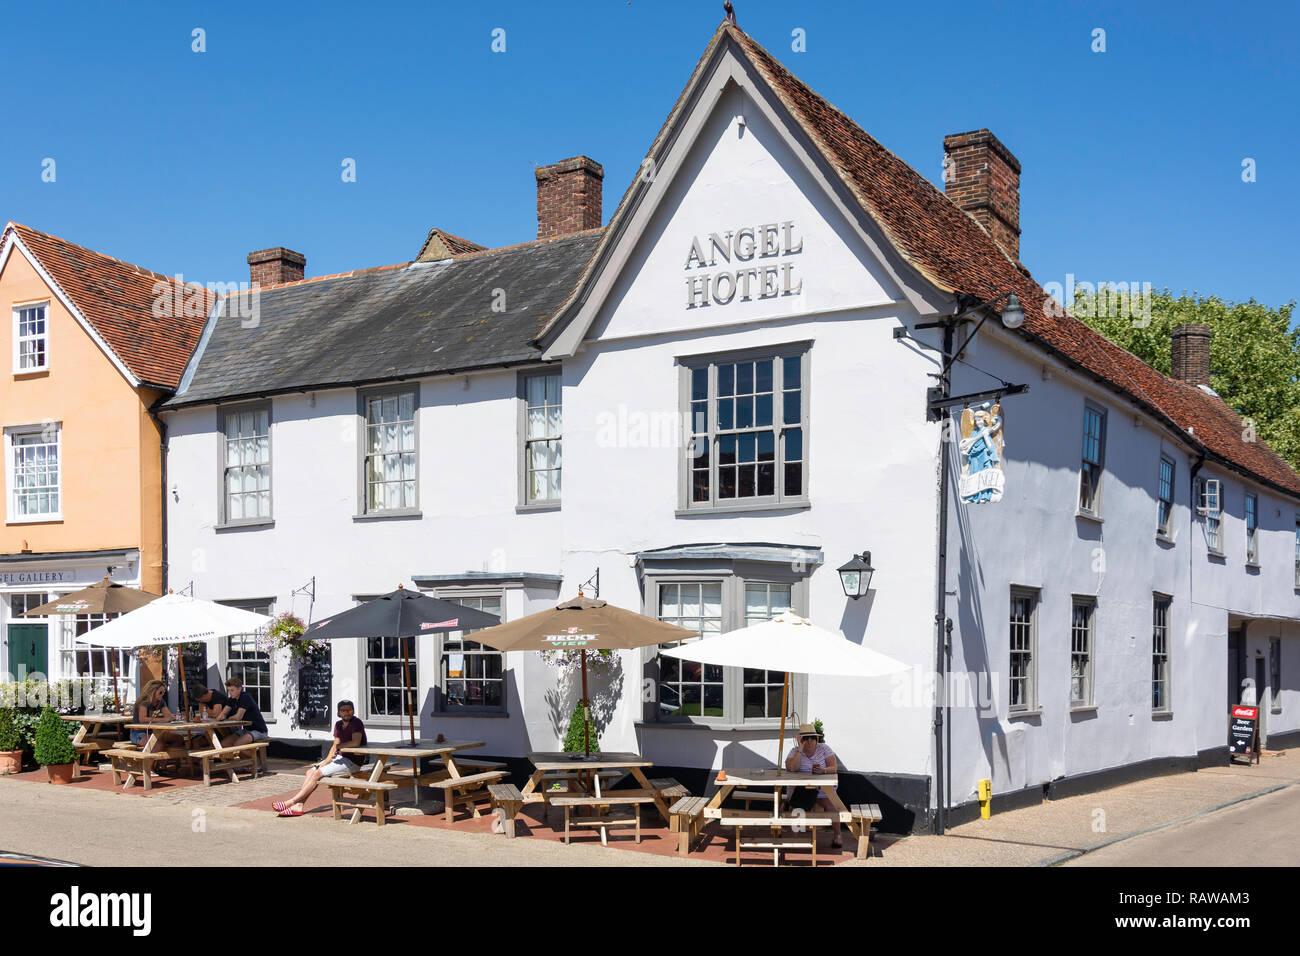 15th century The Angel Hotel, Market Square, Lavenham, Suffolk, England, United Kingdom Stock Photo